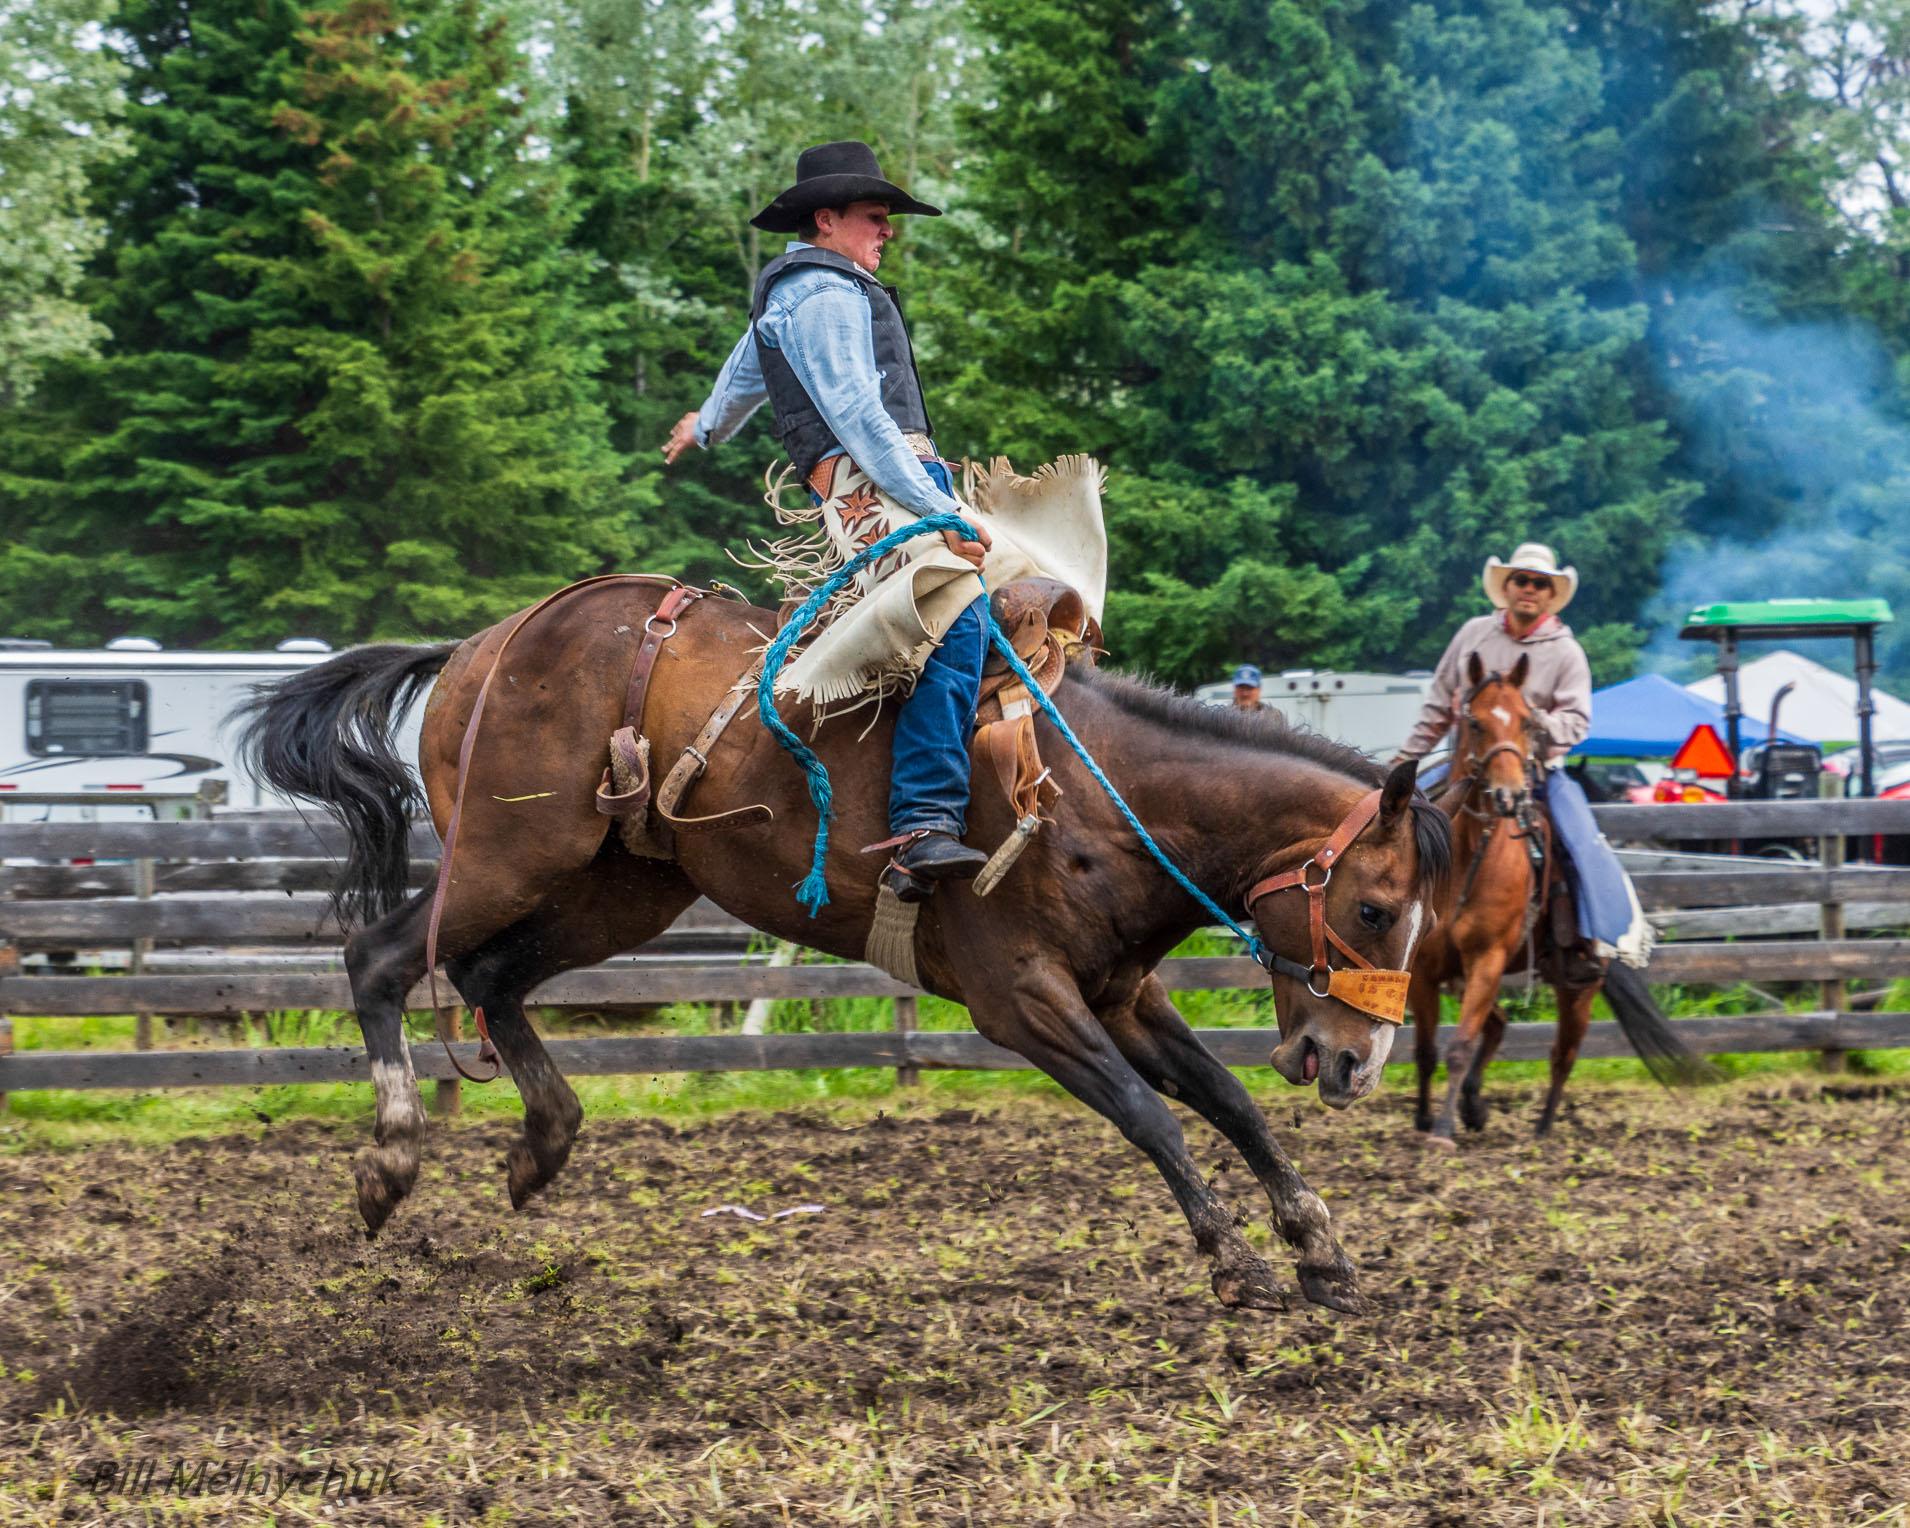 Rodeo_DSC0907-026 - Bill Melnycuk